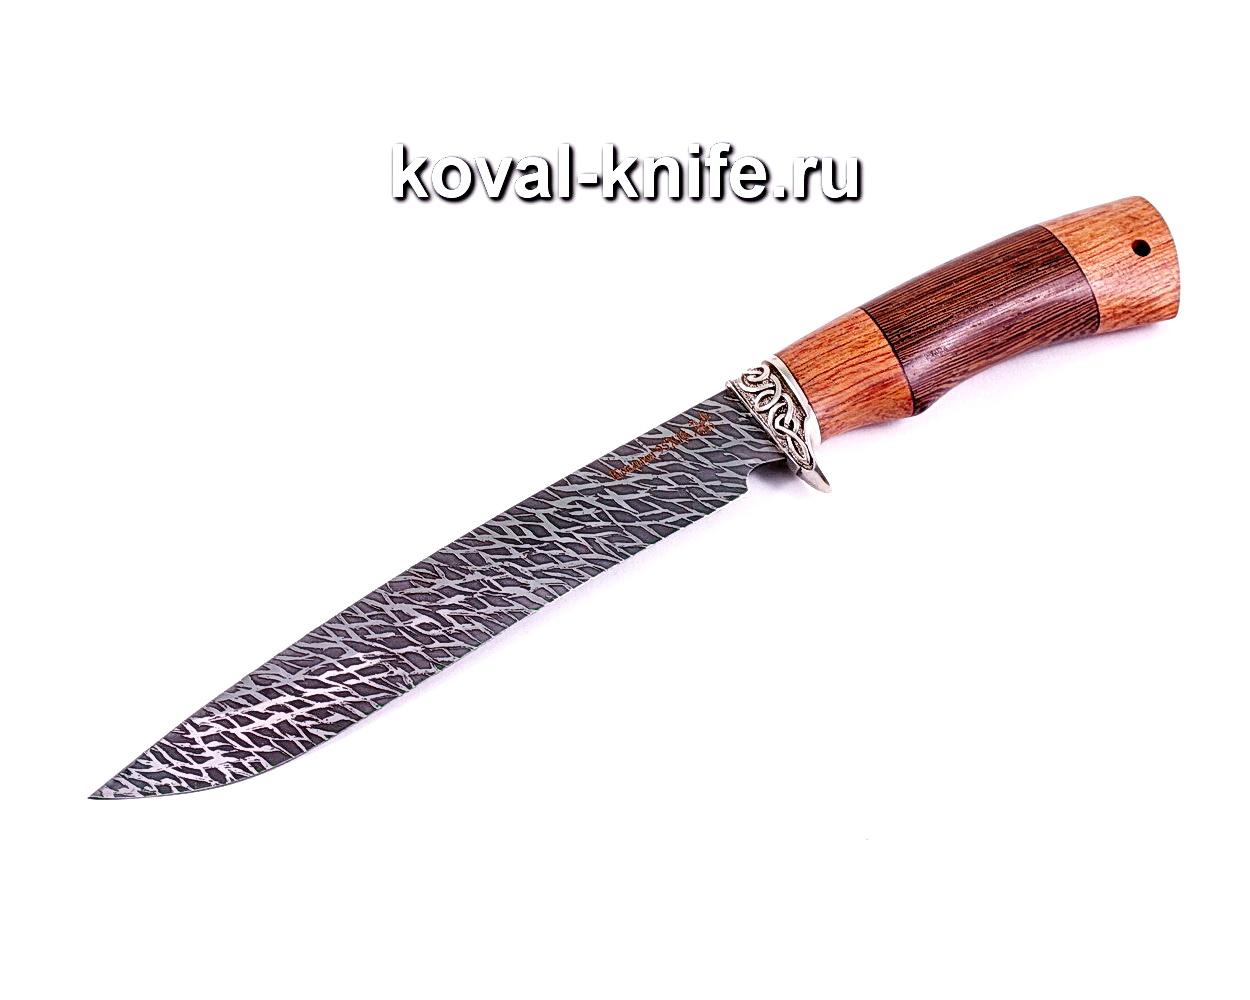 Нож Свинорез (сталь 95х18), рукоять бубинга, венге, литье A009